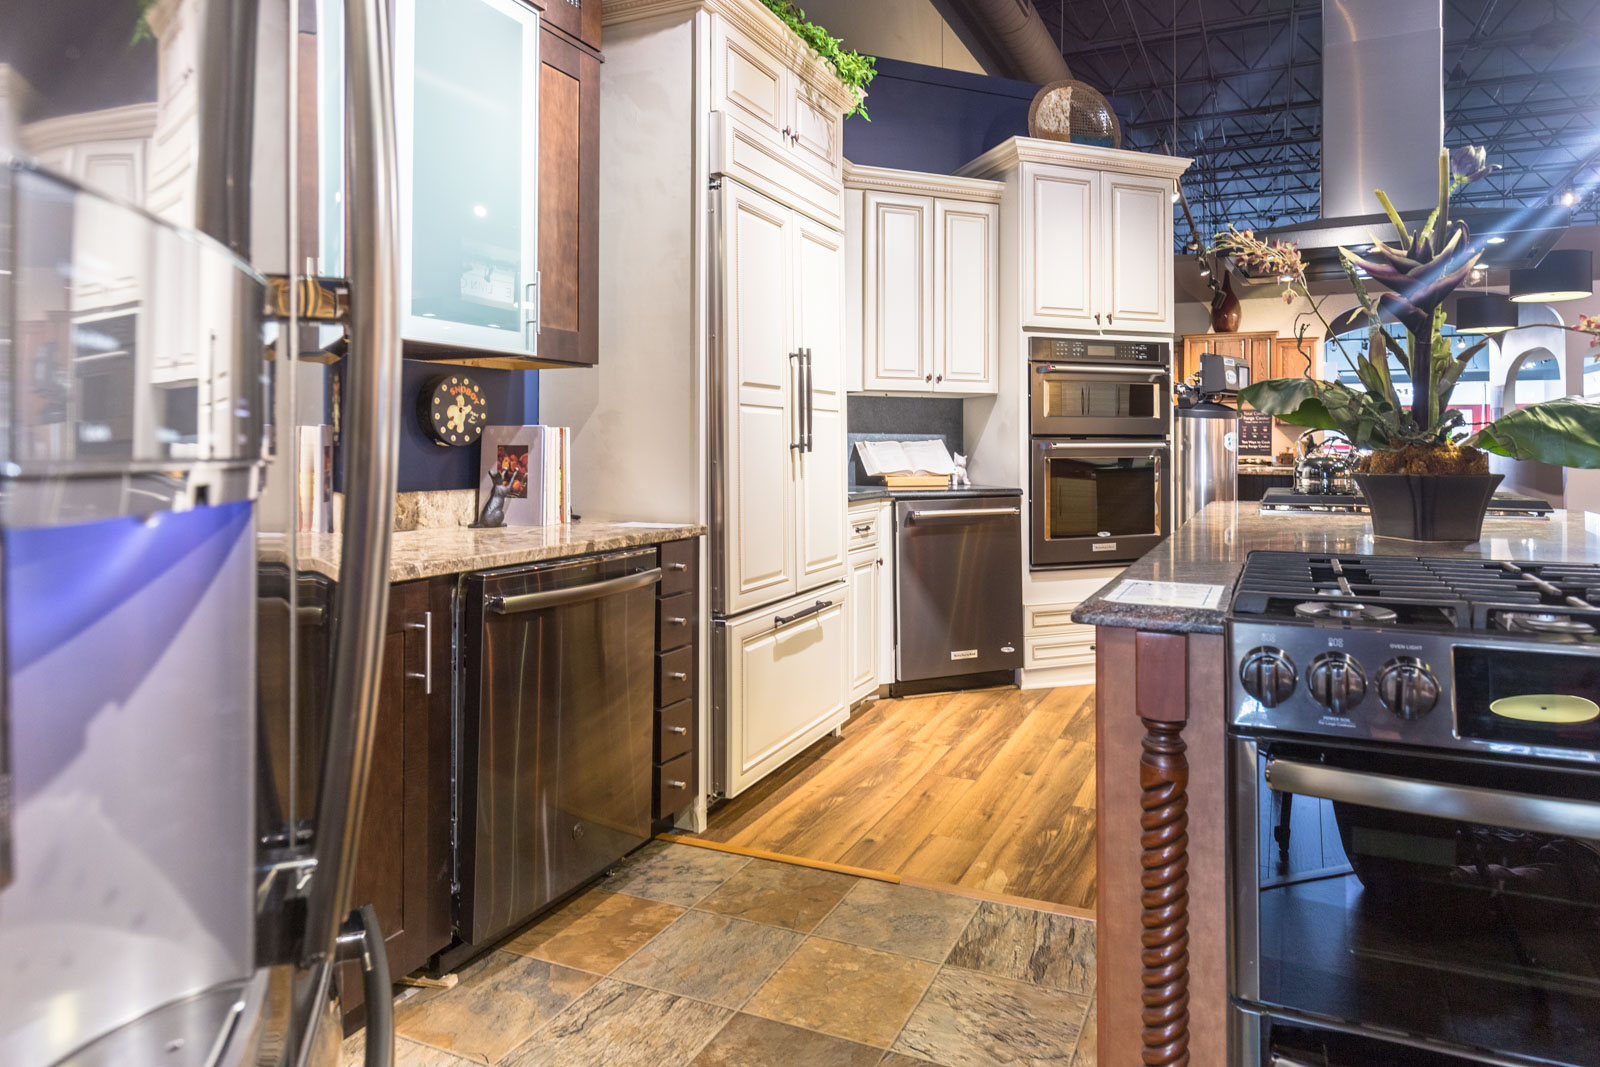 Twin Cities Kitchen Appliance Supplier